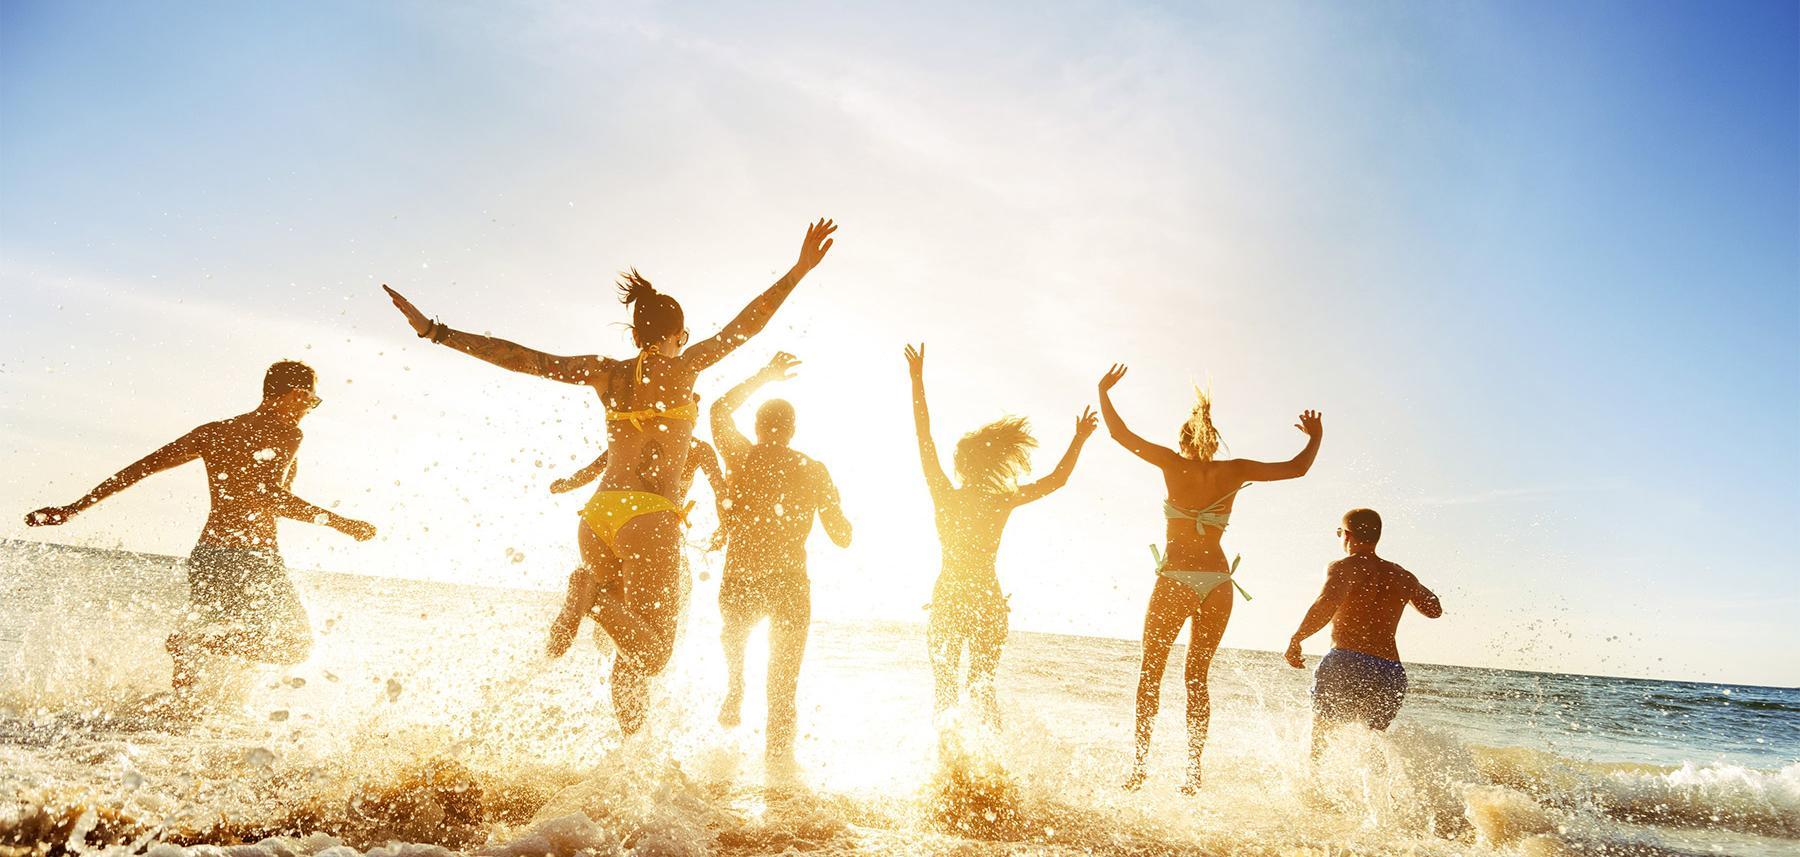 Students enjoying the ocean at Myrtle Beach